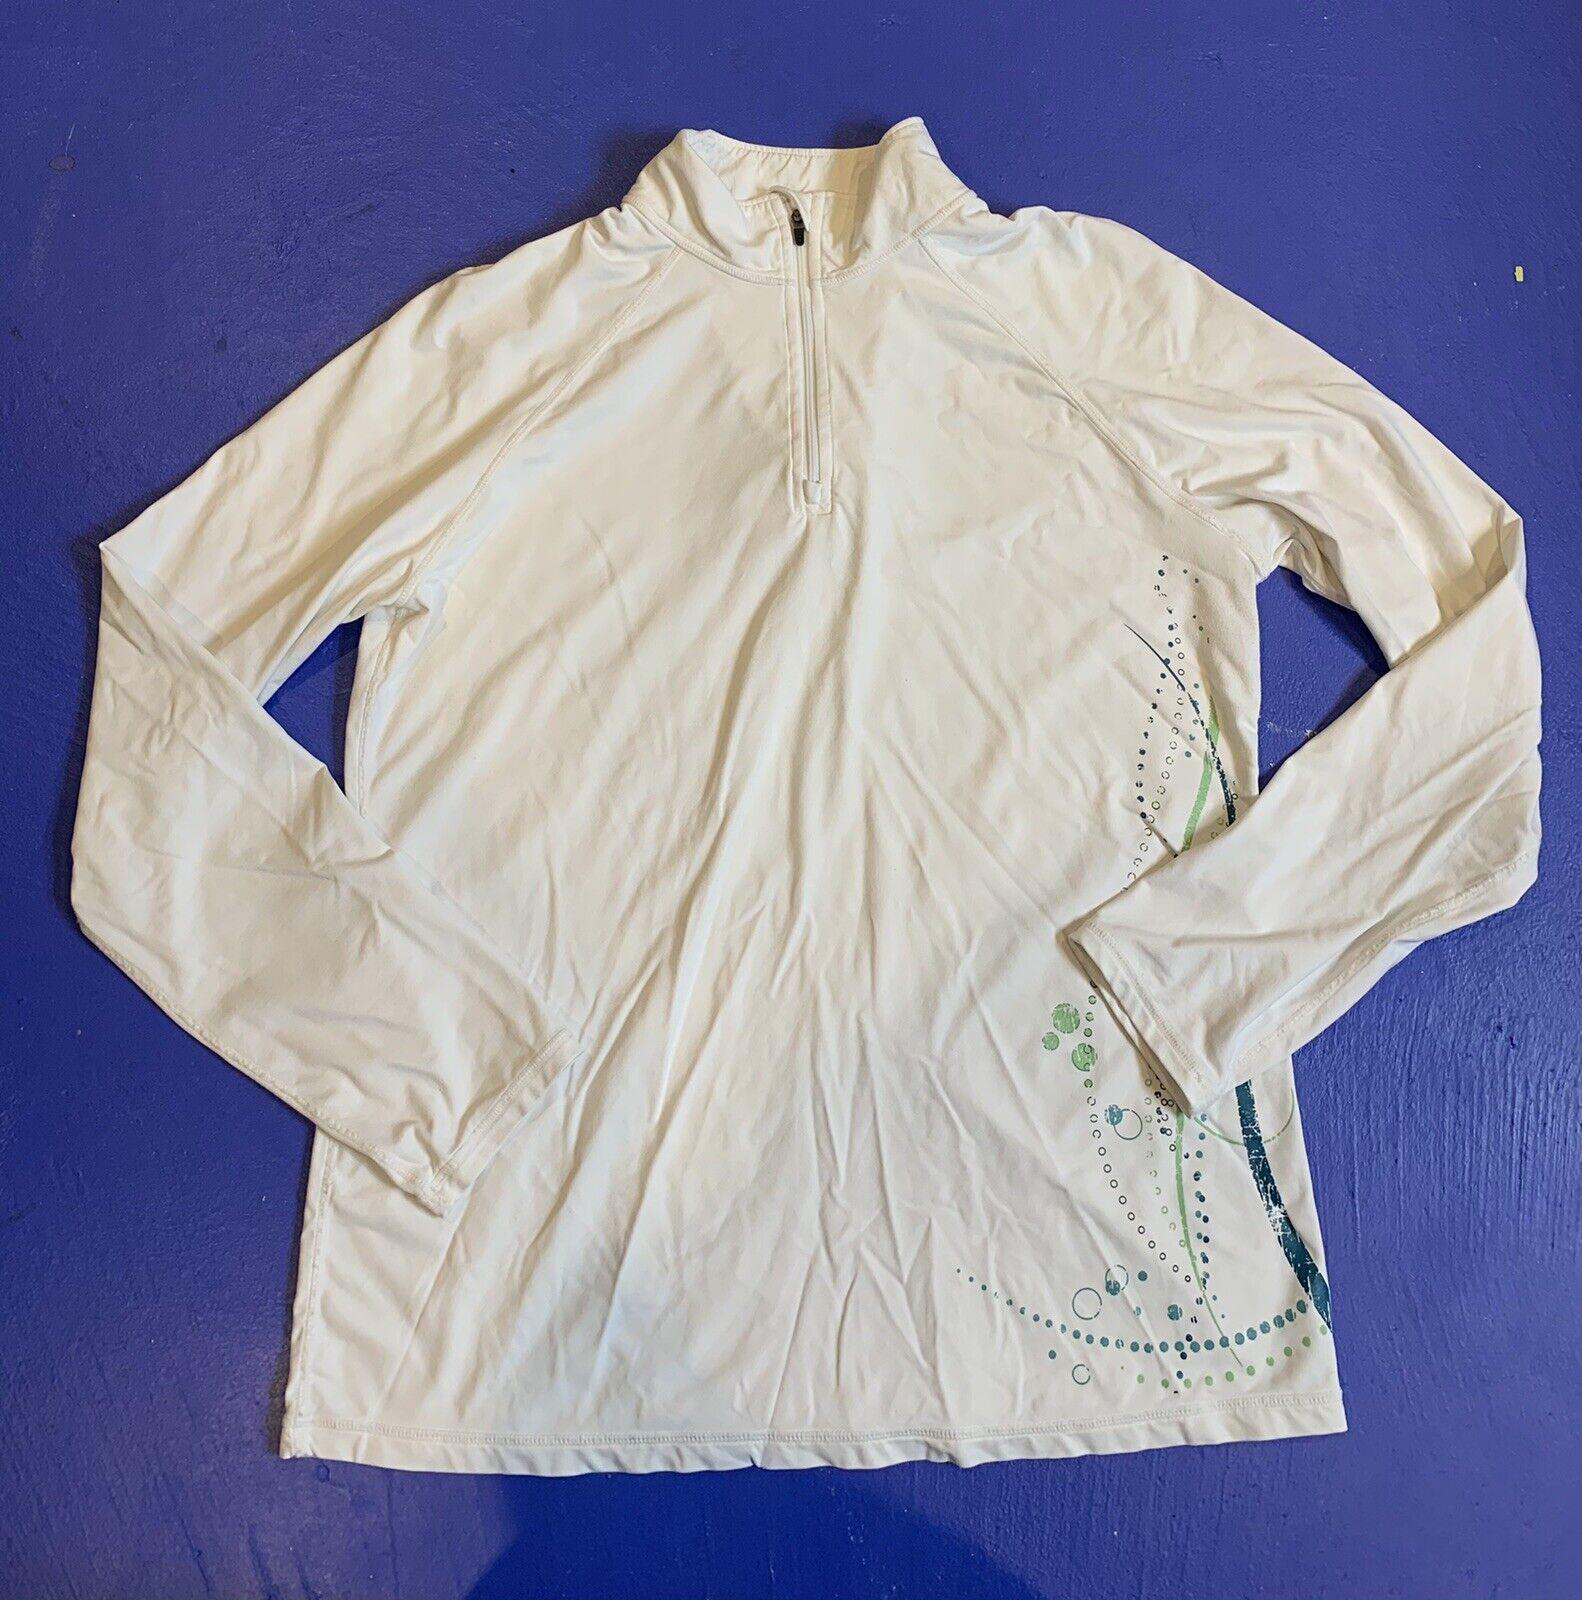 Title Nine 1/4 Zip Long Sleeve Pullover Athletic Jacket Womens Size Large White